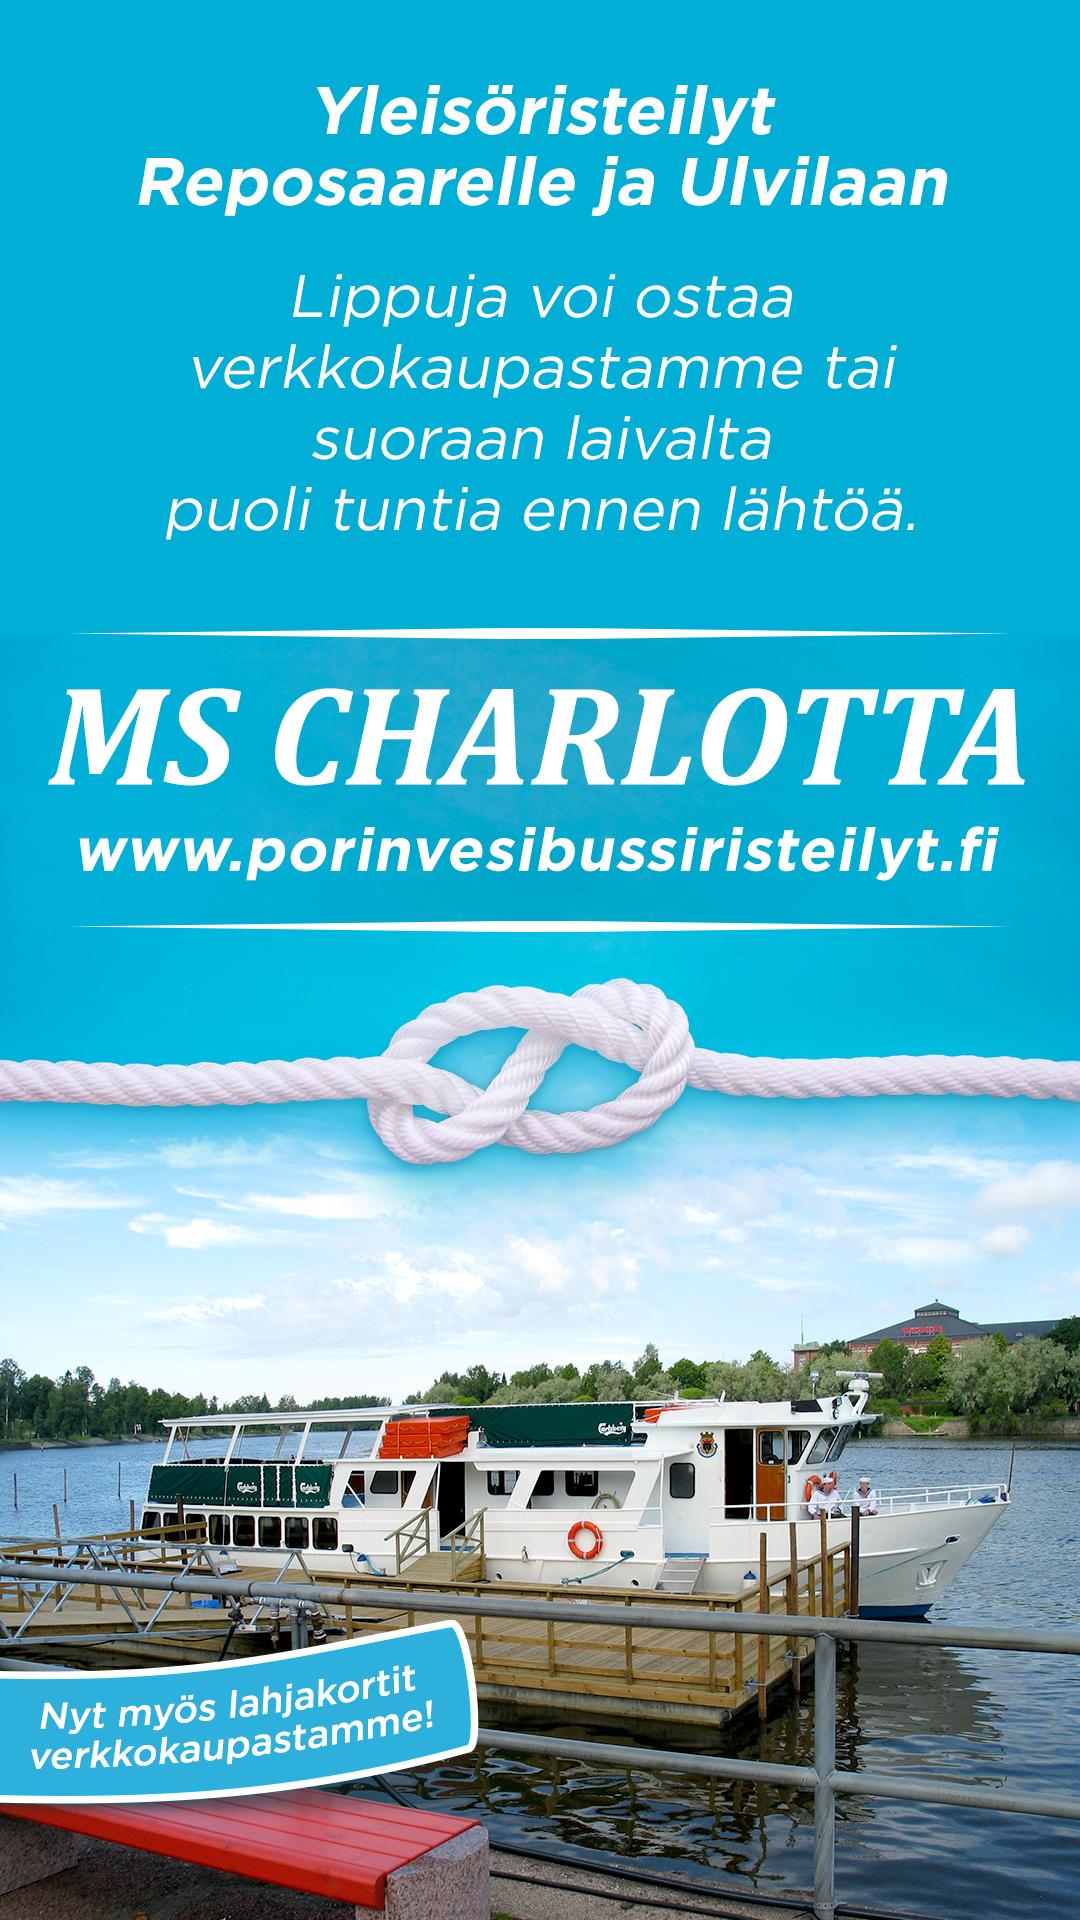 Yleisöristeily Porista Ulvilaan ke 3.7